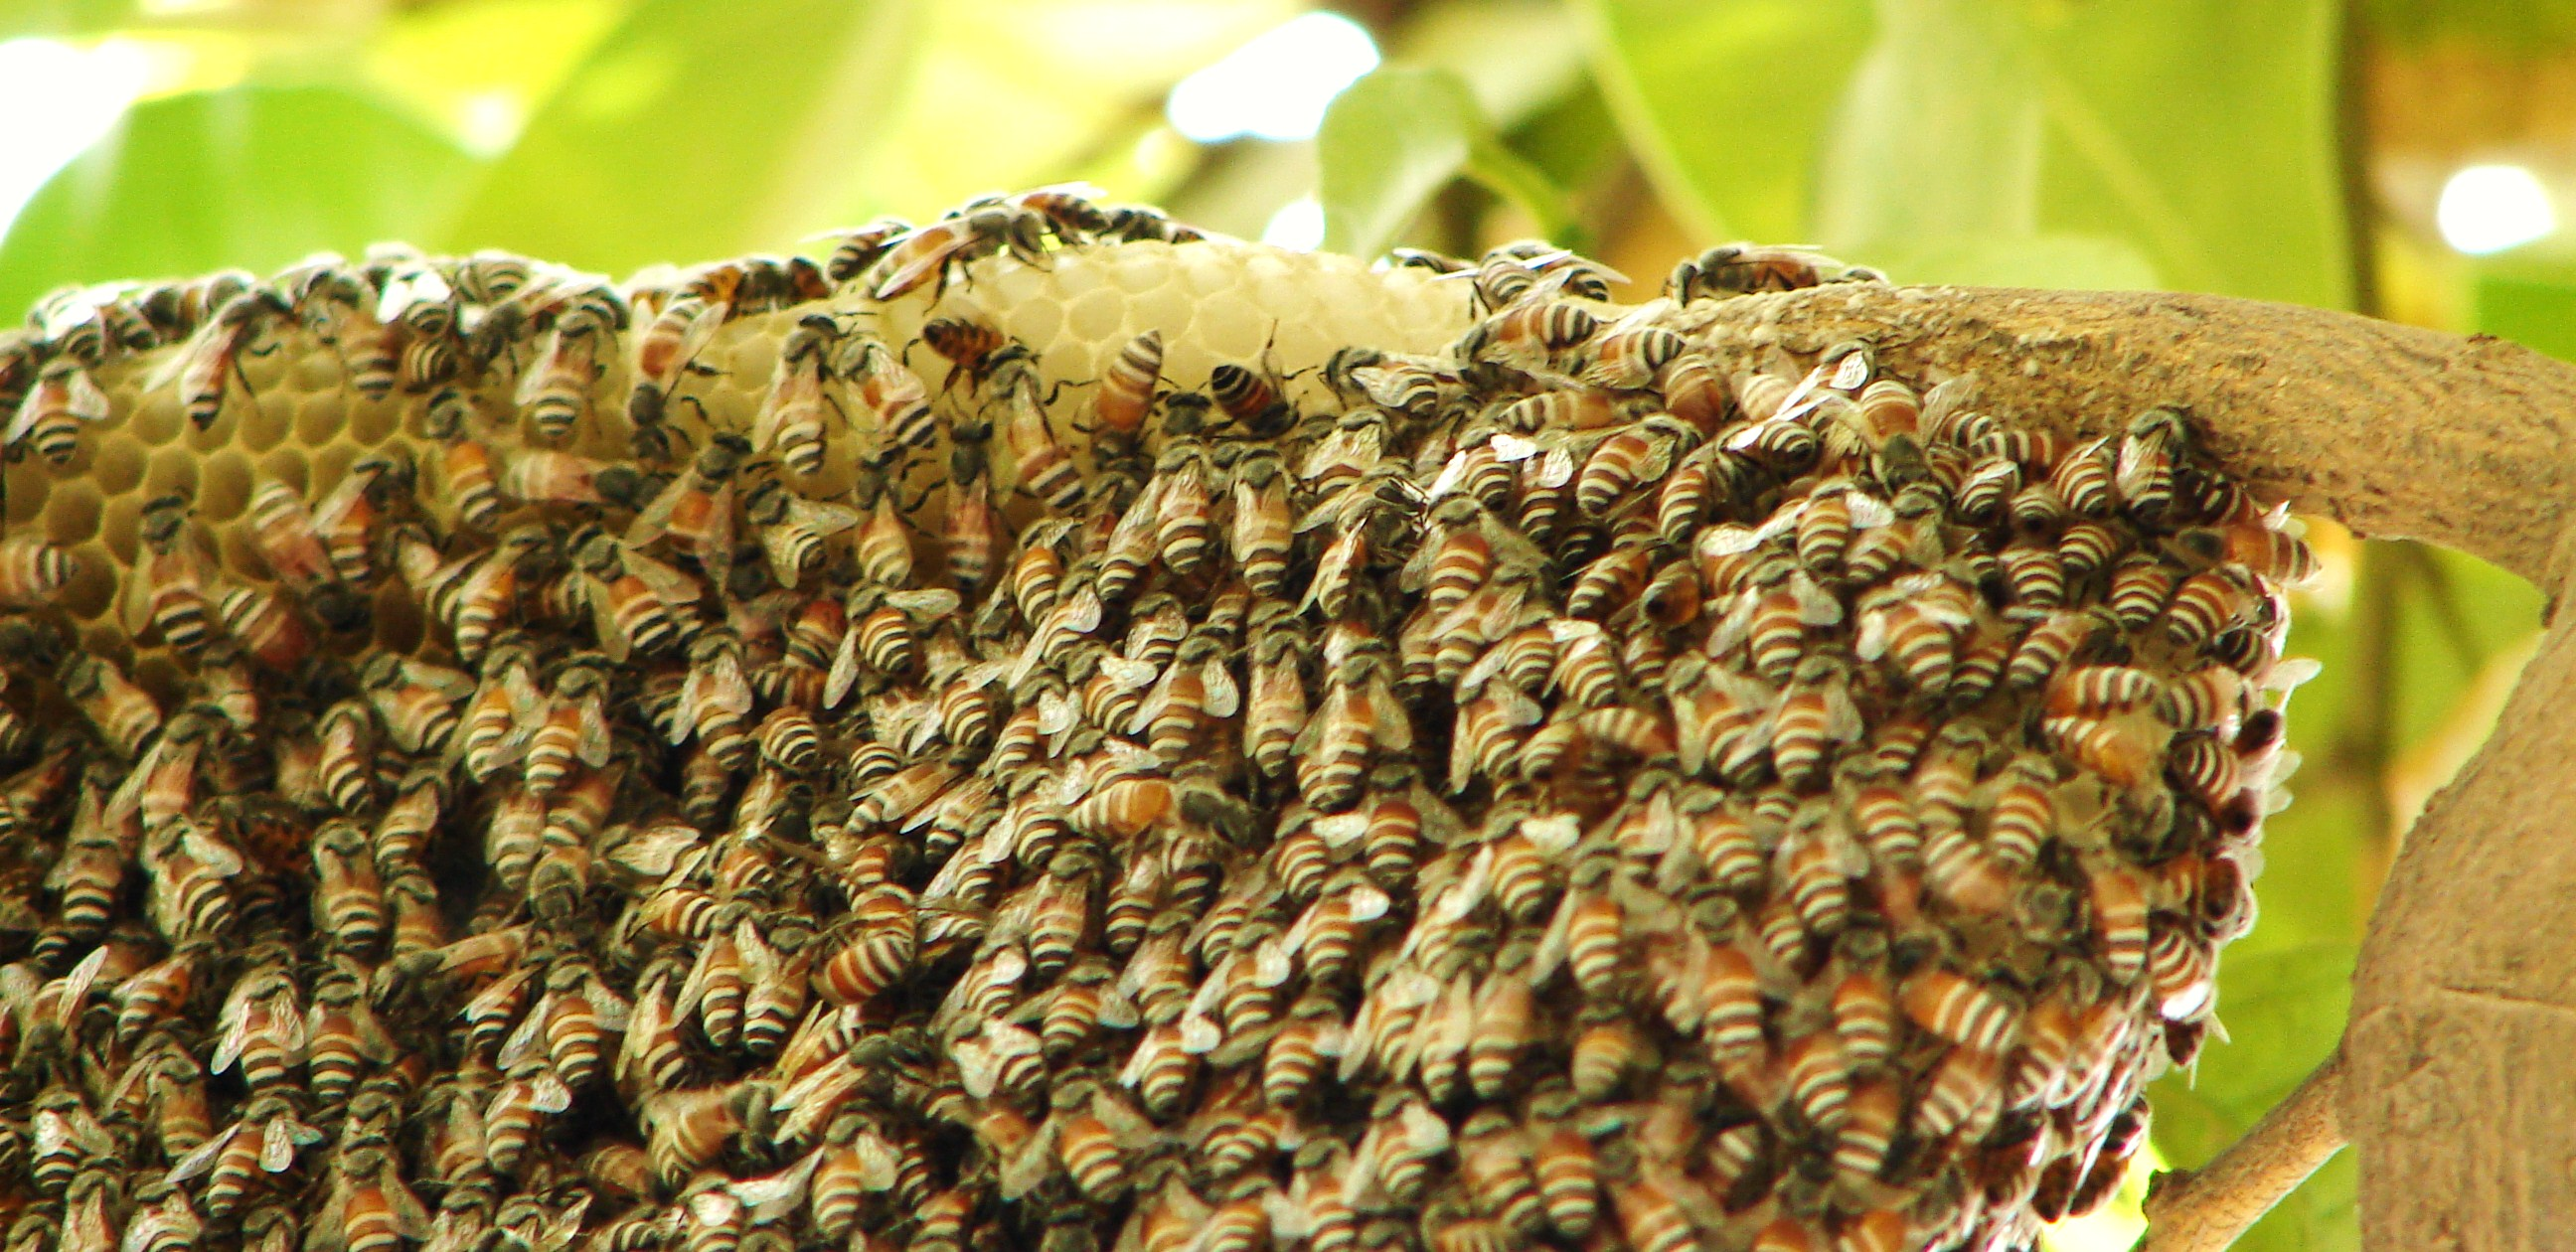 Beehive - photo#24